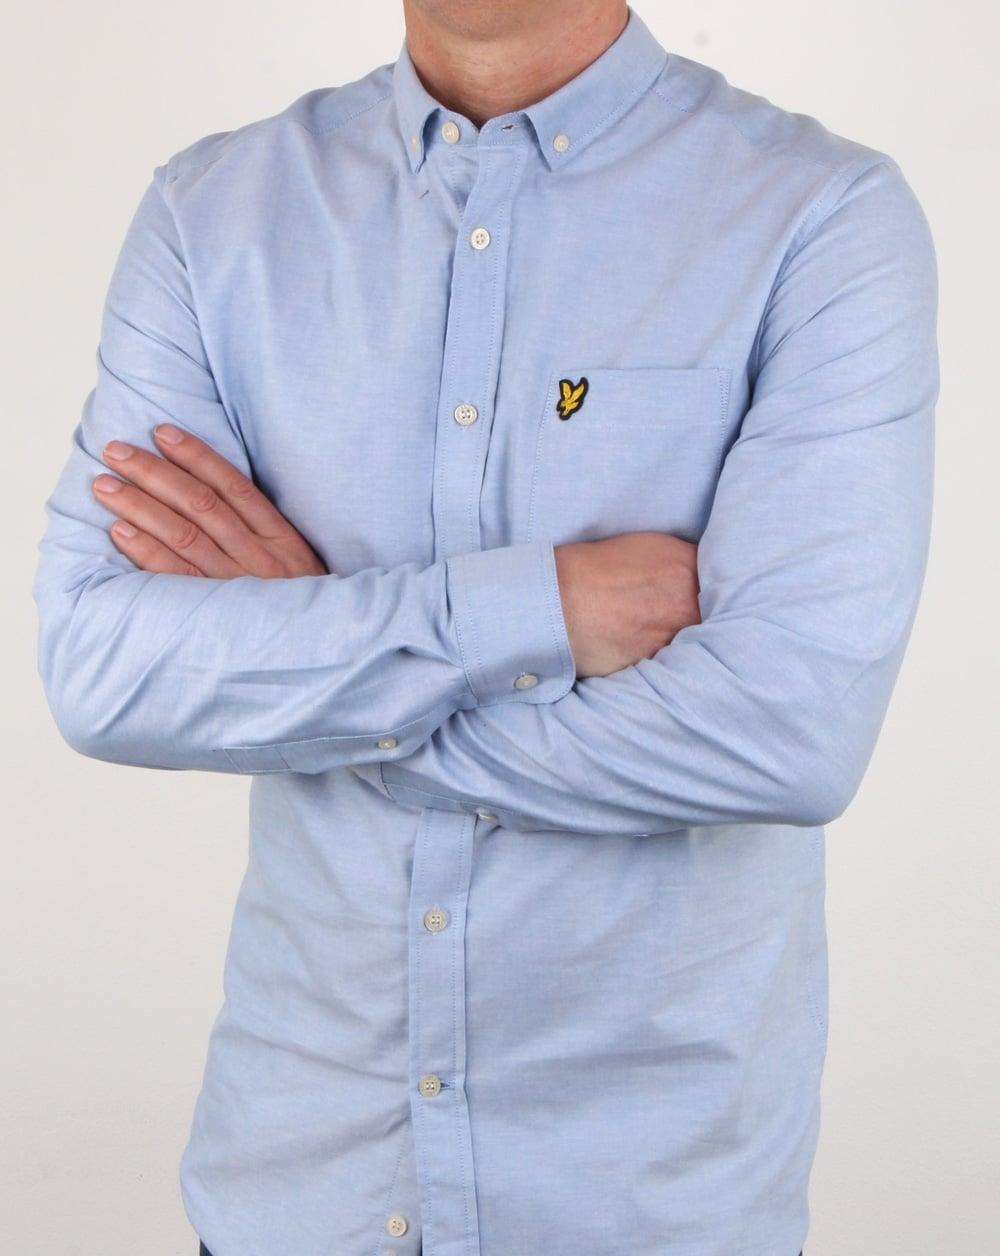 lyle and scott oxford shirt riviera oxford long sleeve mens smart. Black Bedroom Furniture Sets. Home Design Ideas